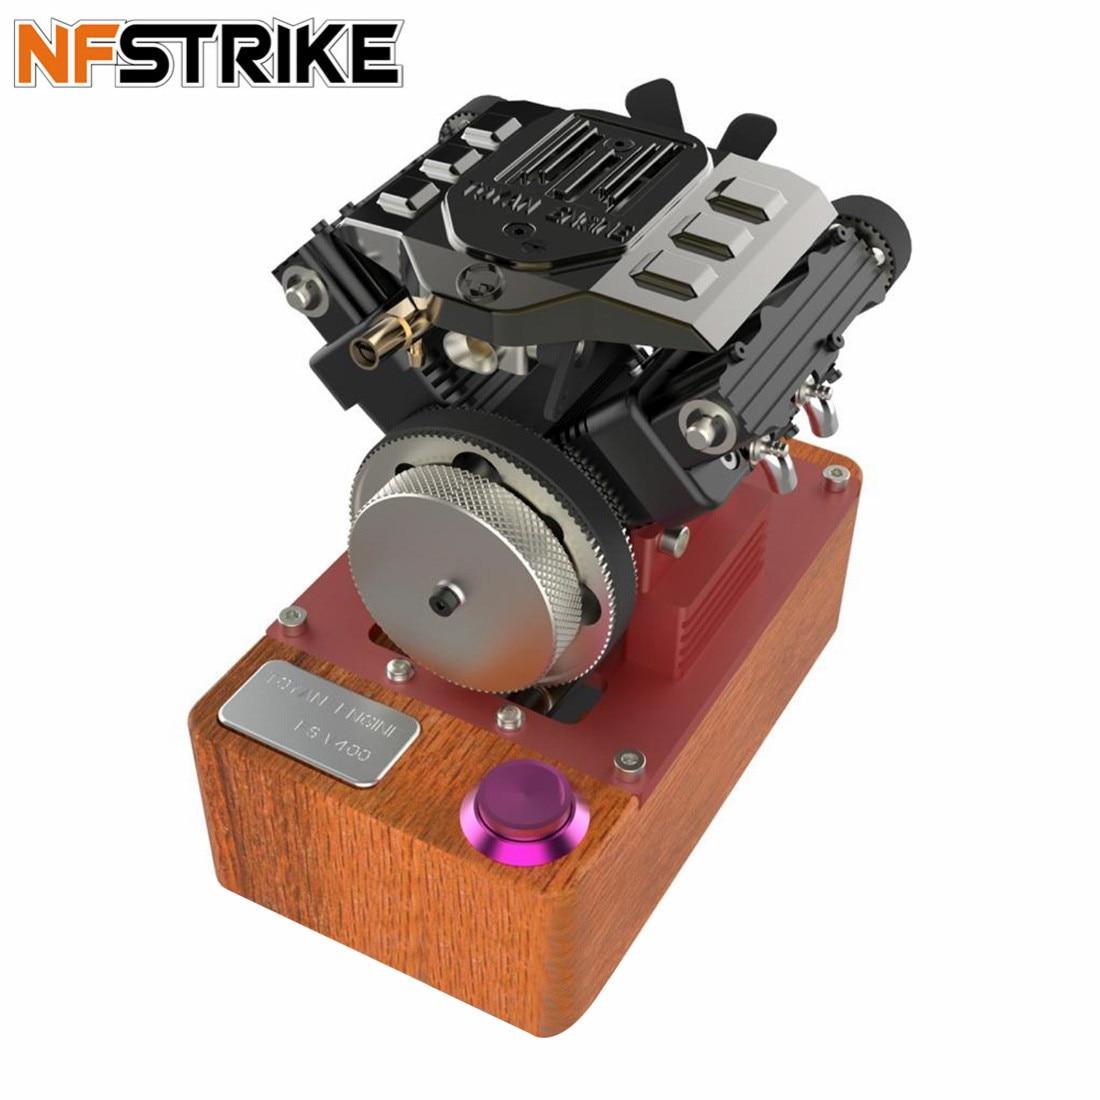 TOYAN V4 Engine Four Cylinder Four Stroke Methanol Engine FS-V400A Full Edition Engine  For 1:10 1:12 1:14 RC Car Ship Plane